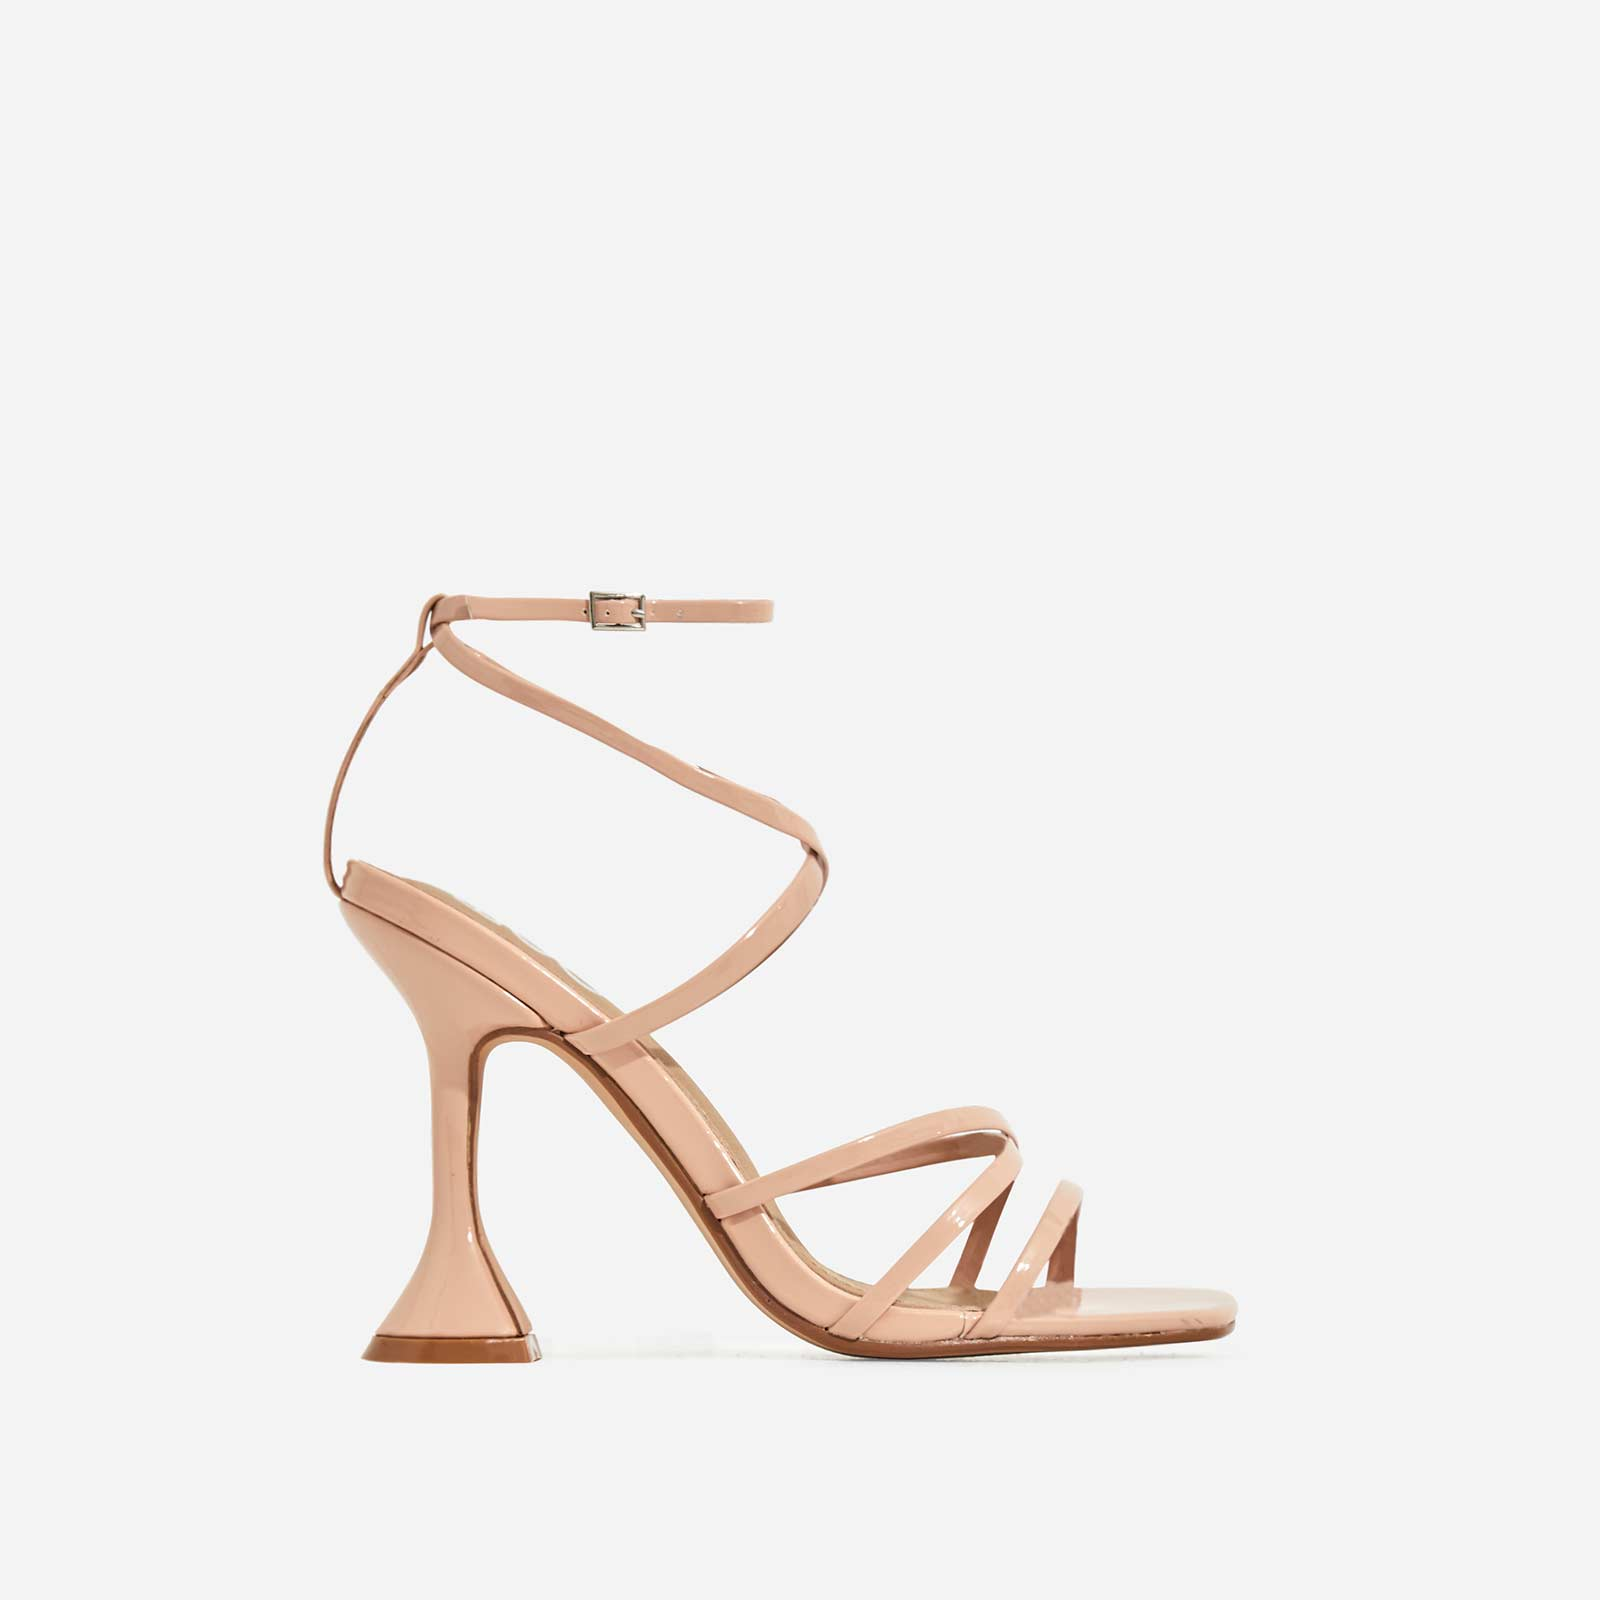 Richie Square Toe Heel In Nude Patent